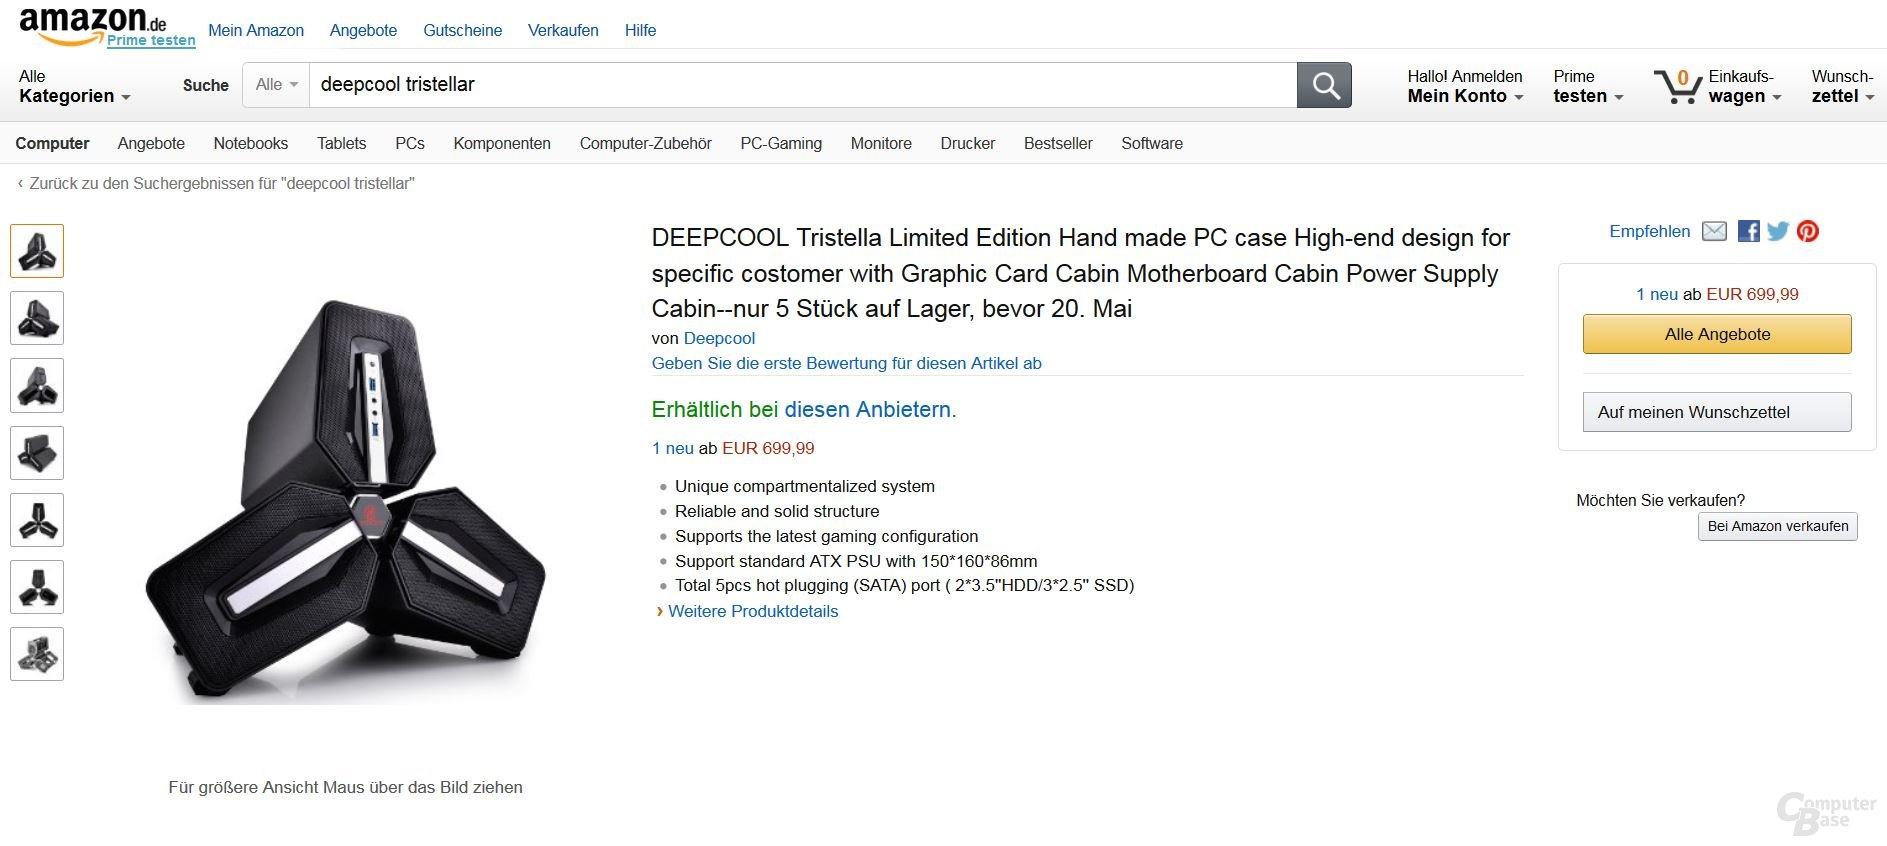 Deepcool TriStellar im Amazon-Shop